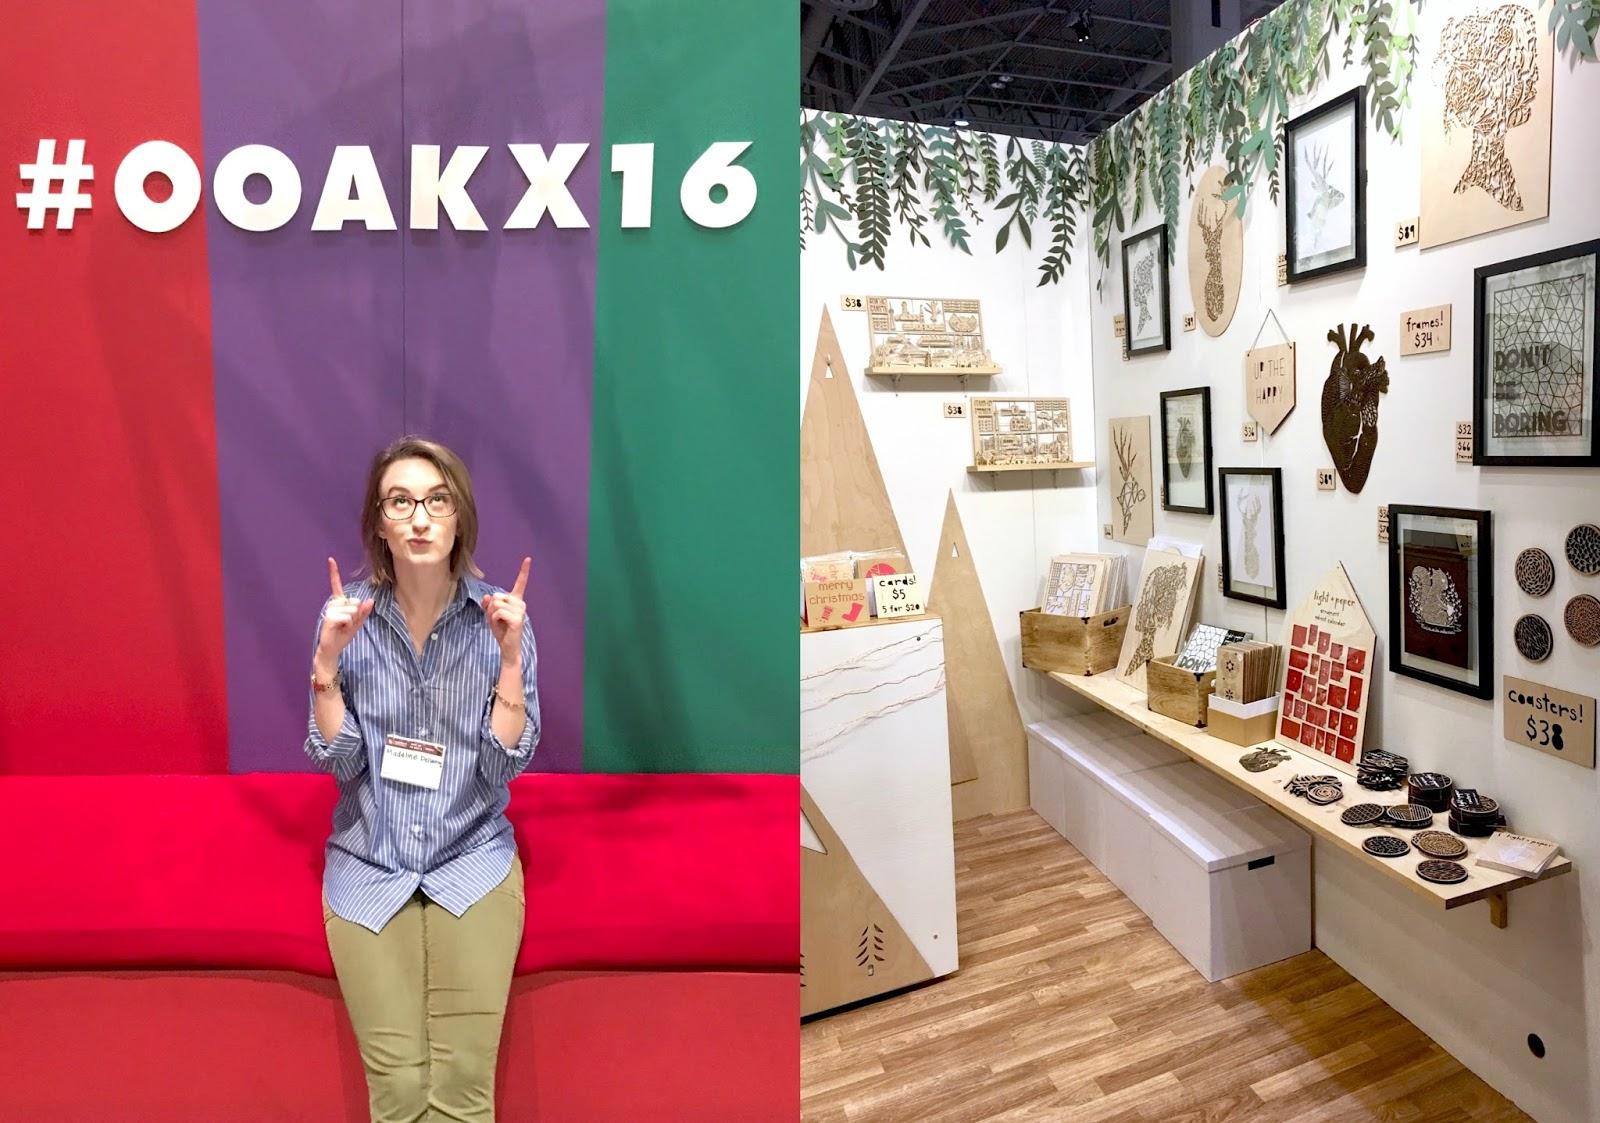 OOAKX16